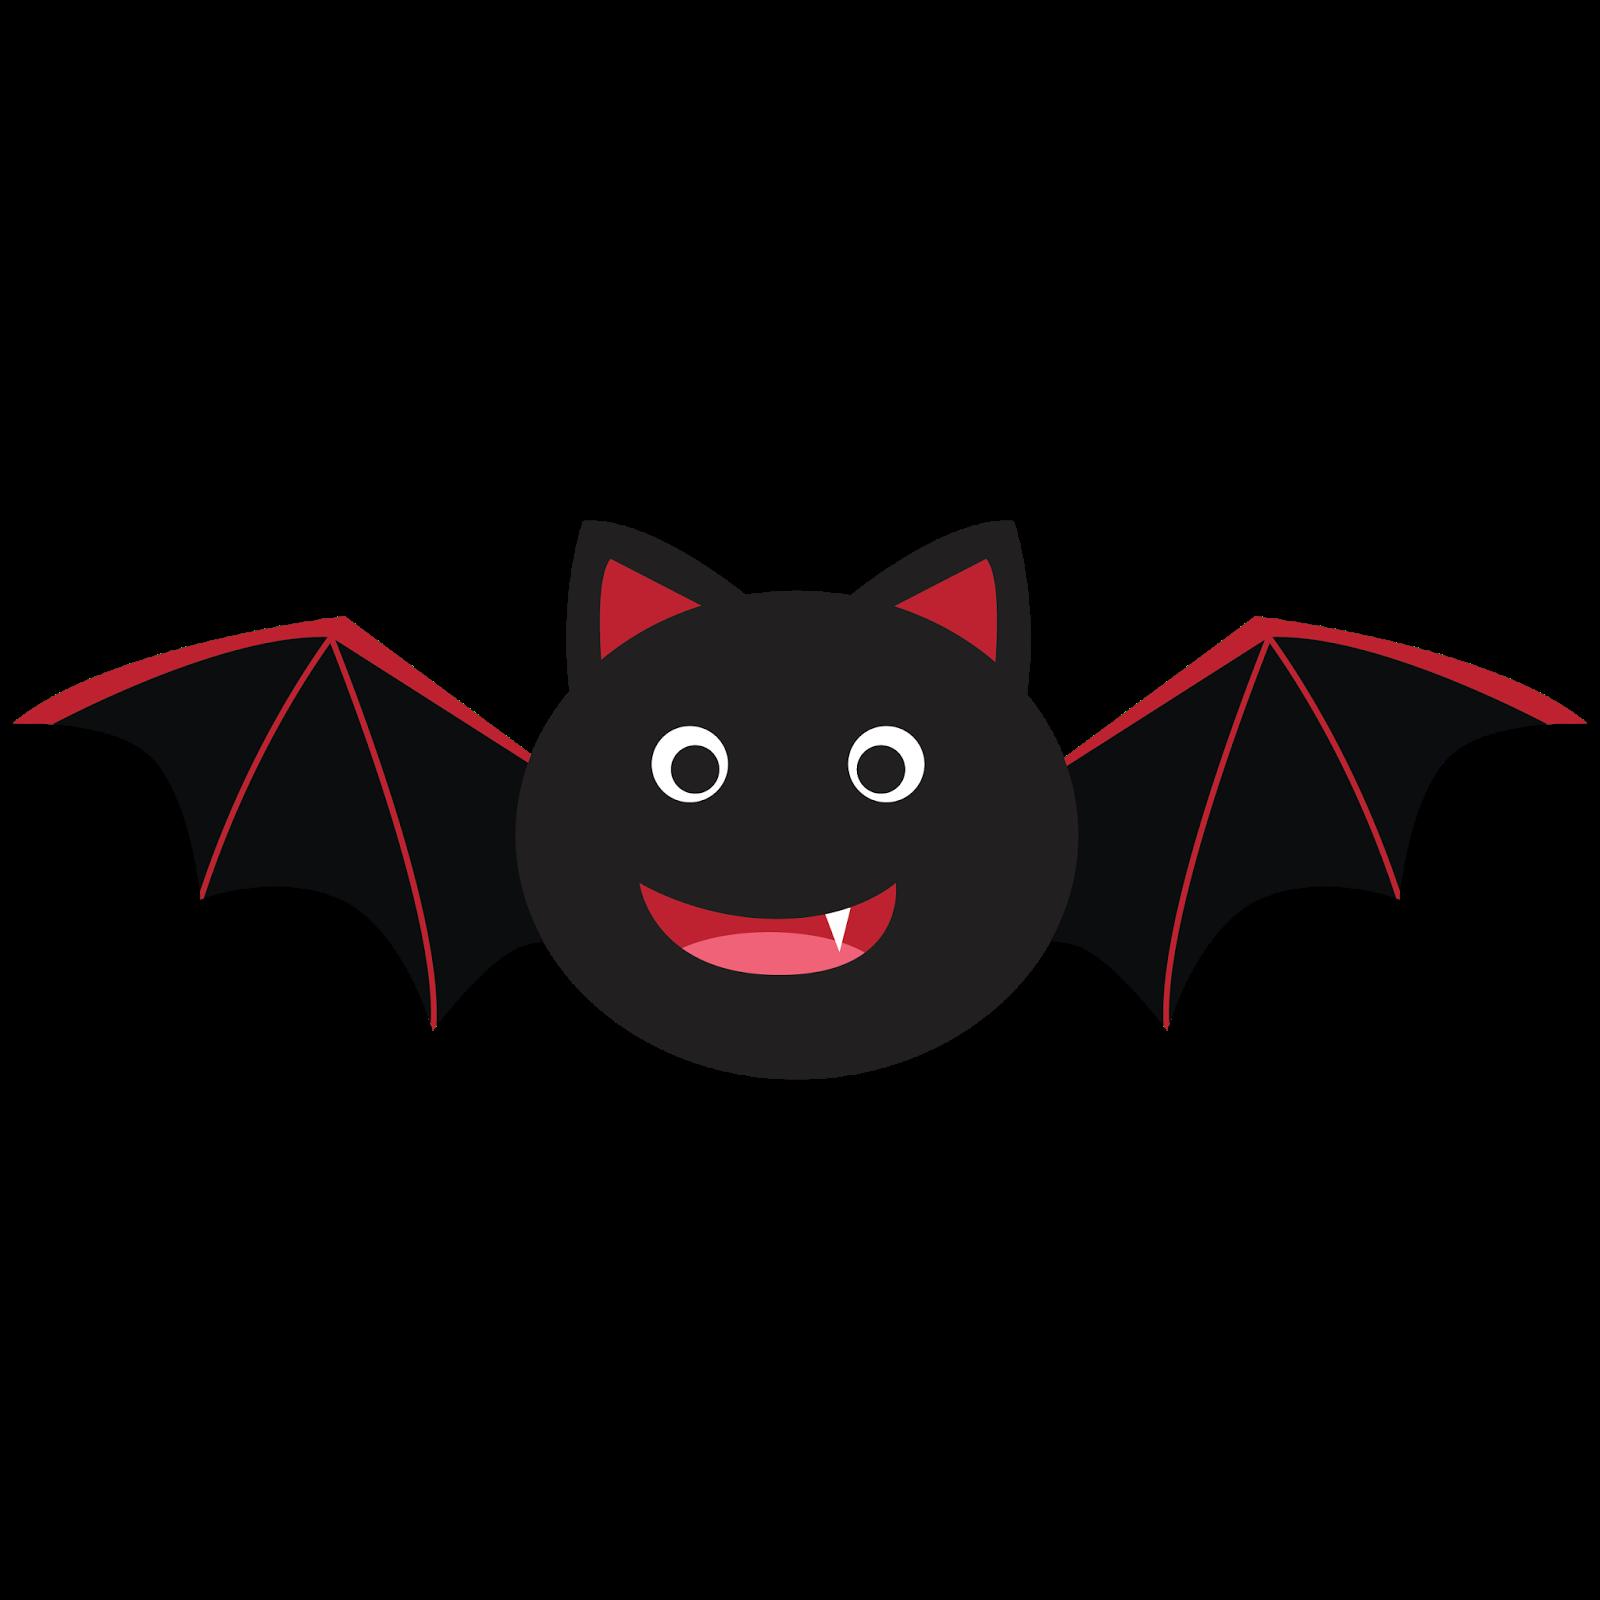 Bat clipart for.